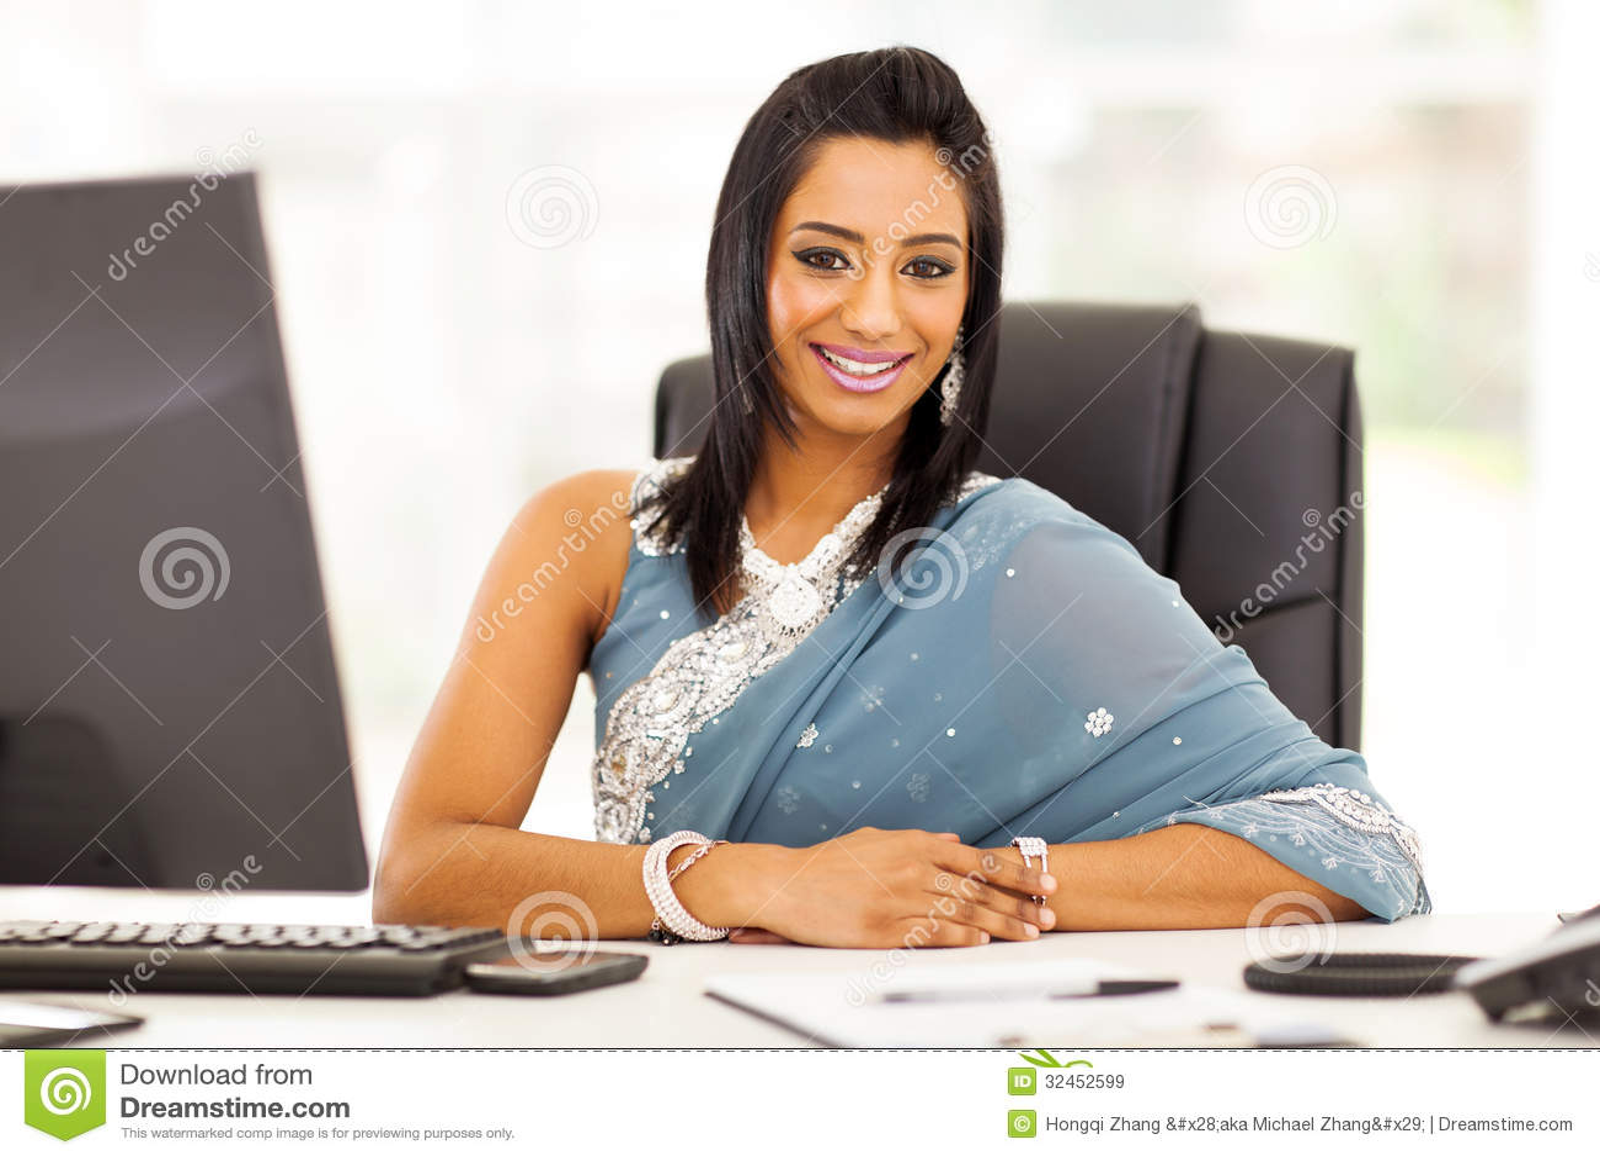 Indian businesswoman sari stock image Image of